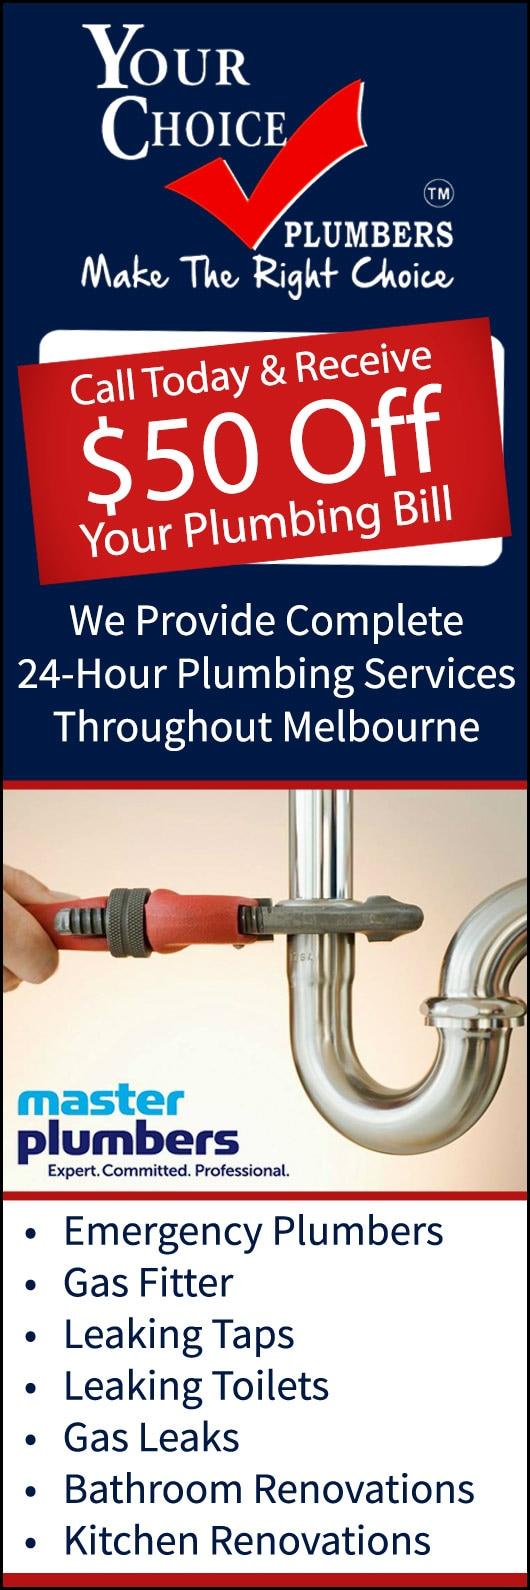 Bathroom Renovations Nunawading your choice plumbers - plumbers & gas fitters - nunawading